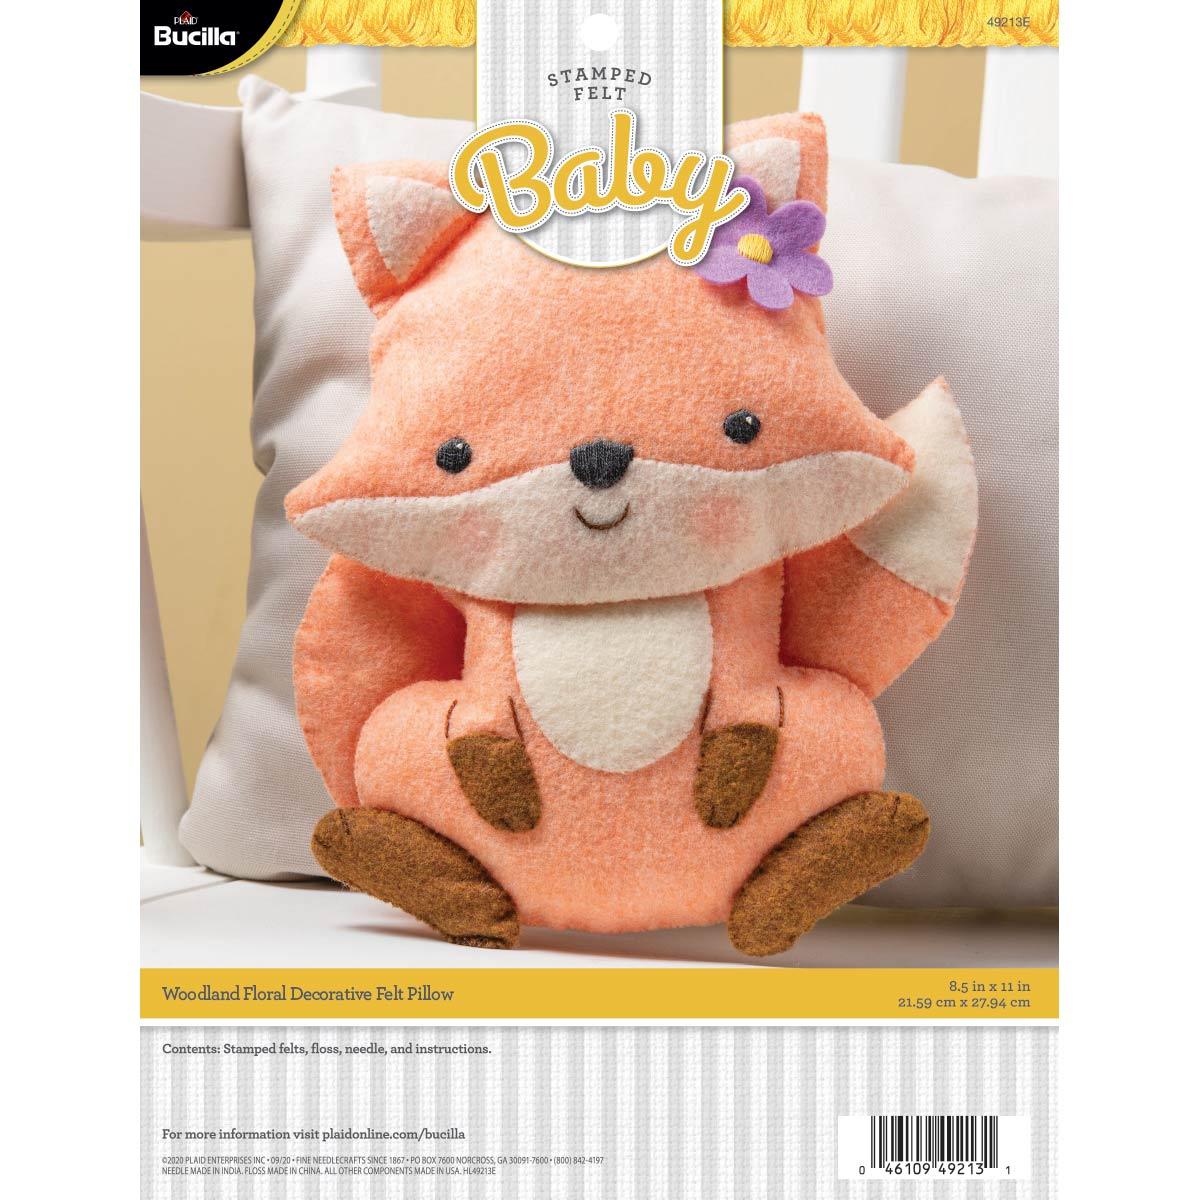 Bucilla ® Baby - Felt - Crib Ensembles - Woodland Floral - Pillow - 49213E